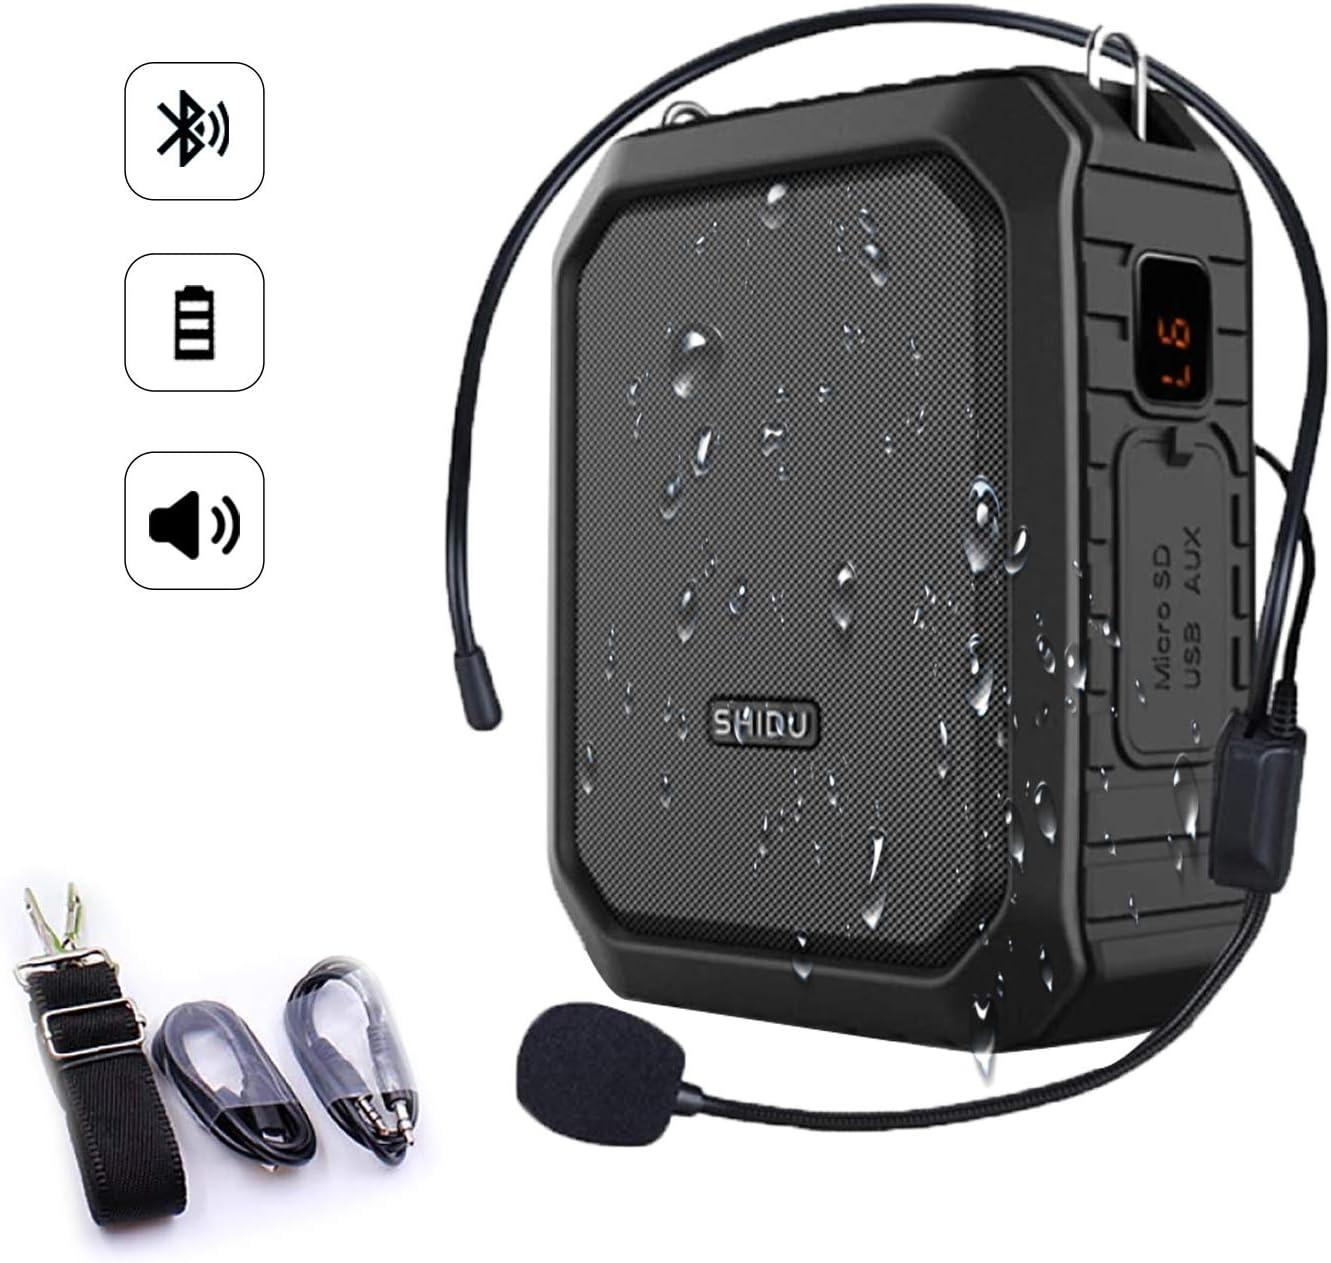 SHIDU Bluetooth Amplificador de voz 18W con auriculares con micrófono con cable Altavoz Bluetooth portátil a prueba de agua Sistema de PA recargable Banco de energía para exteriores, maestros, ducha